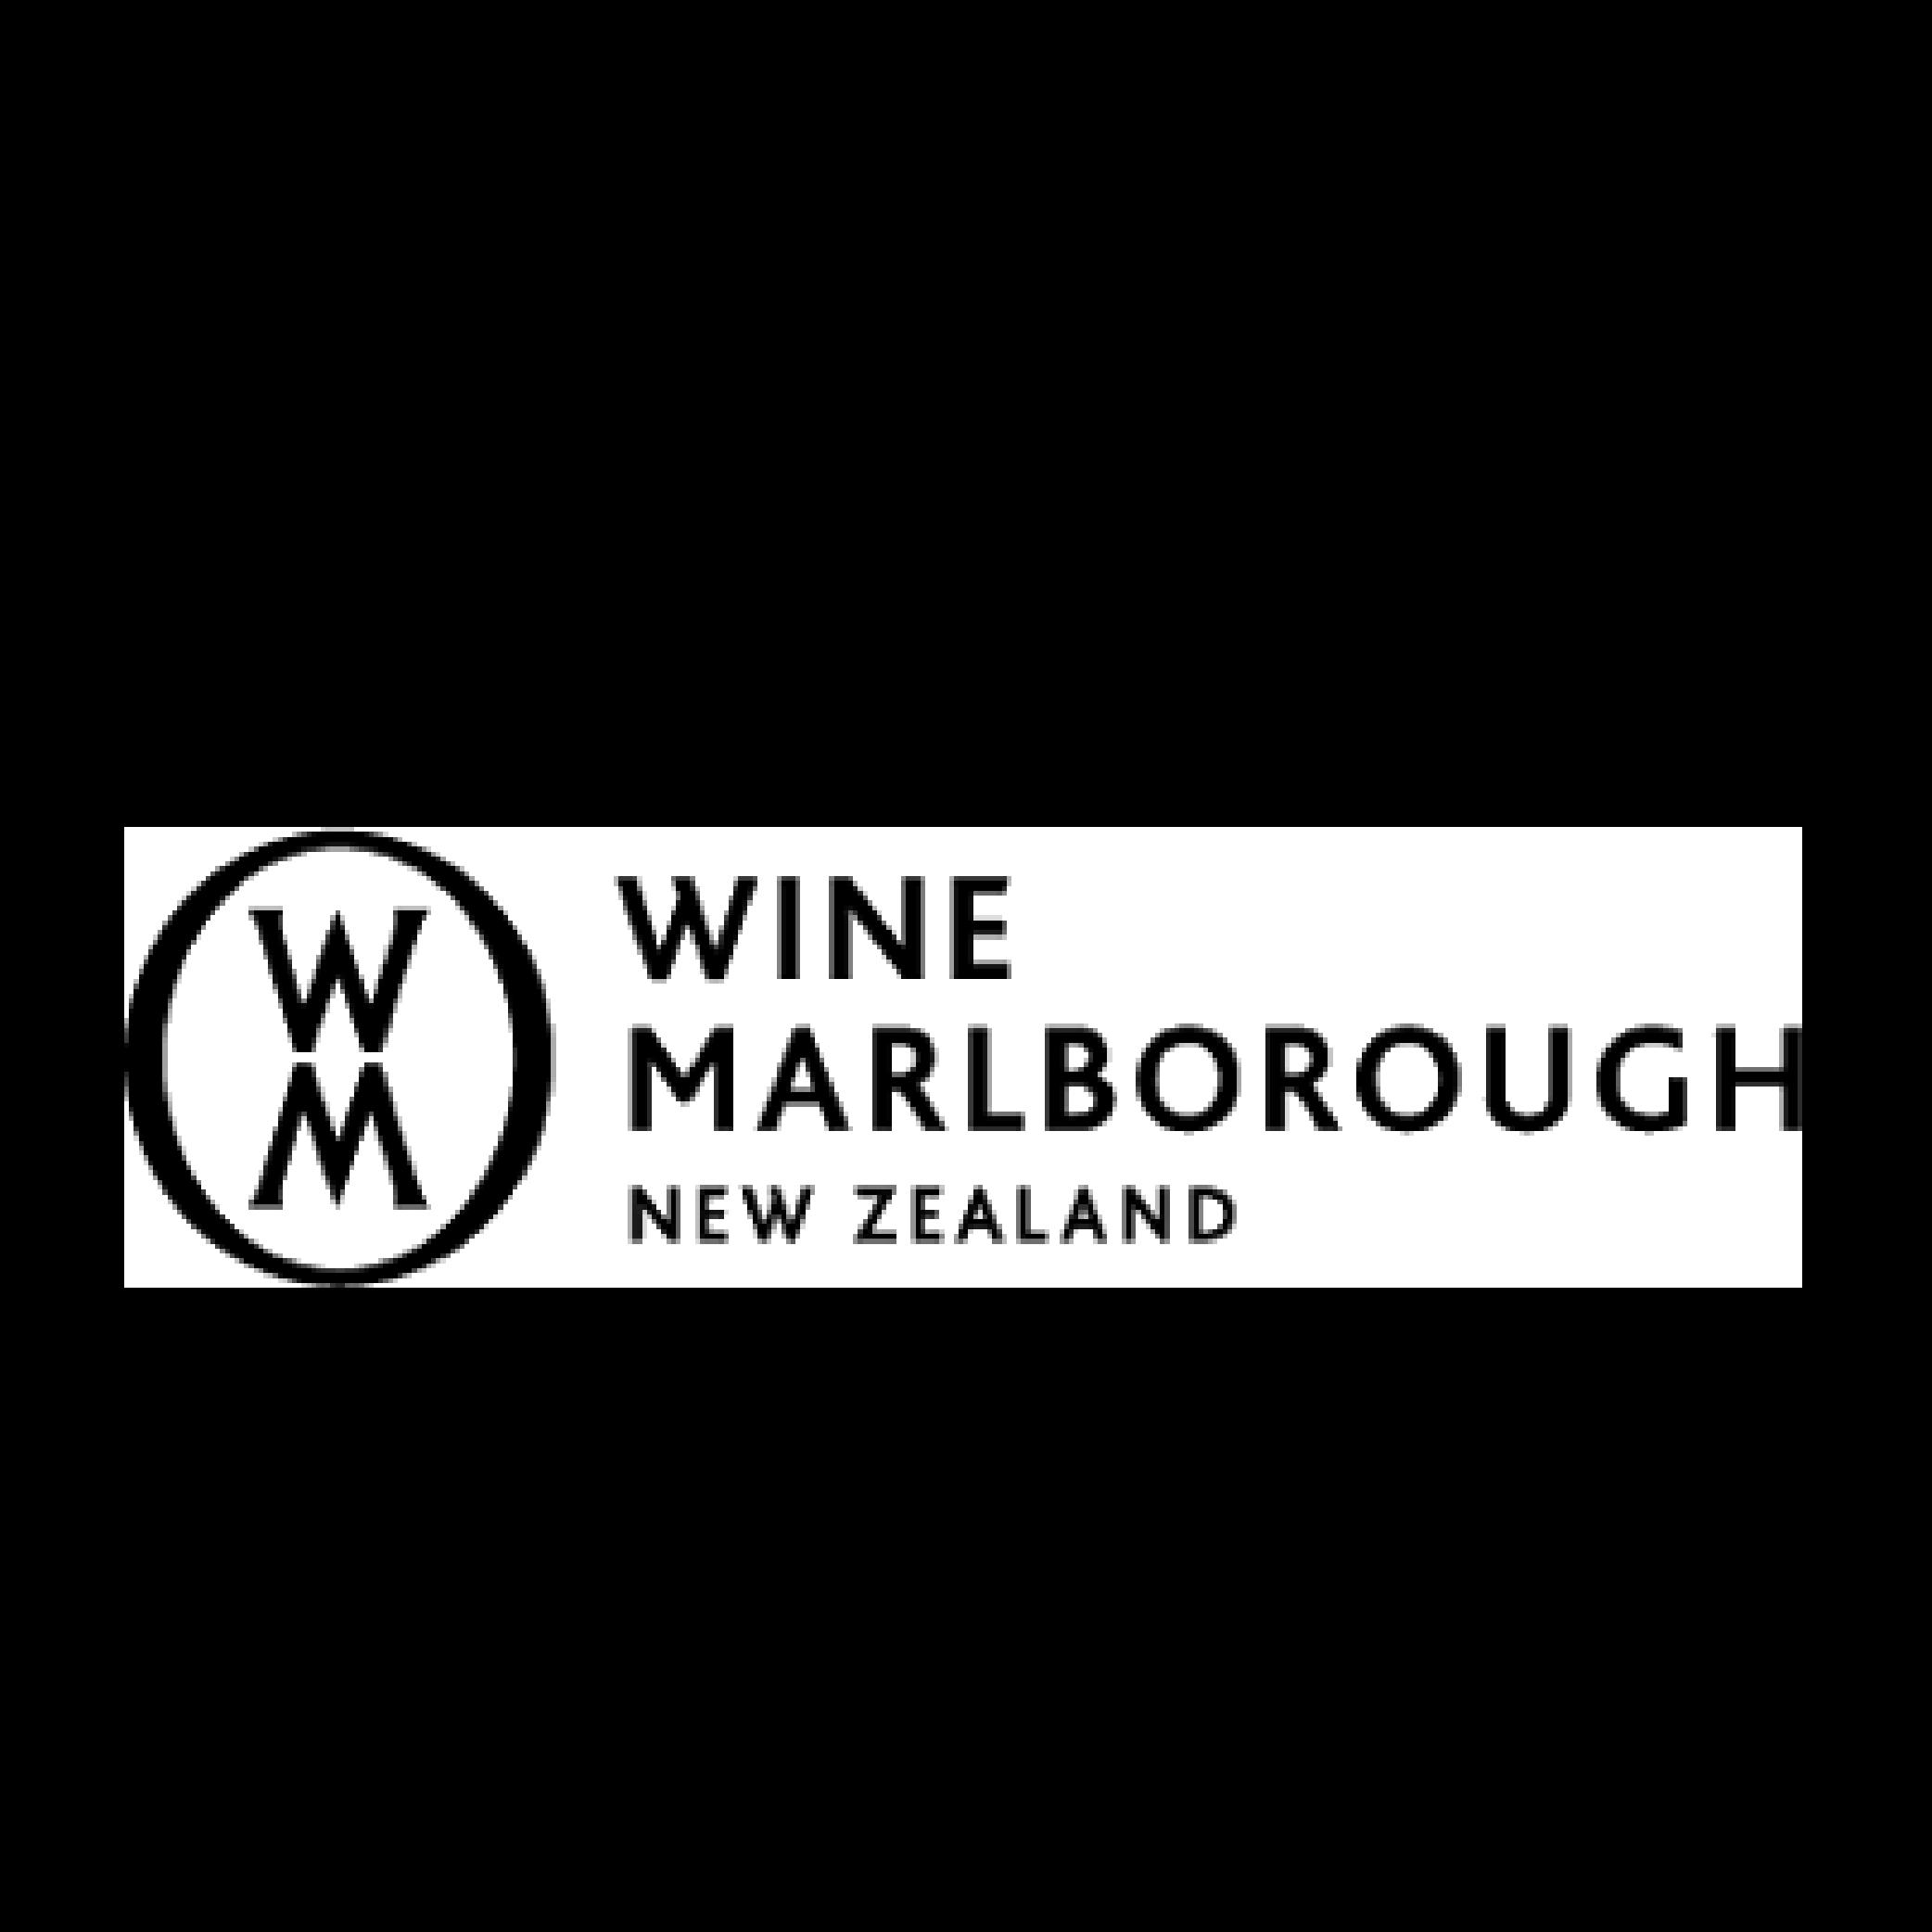 WineMarlborough.png